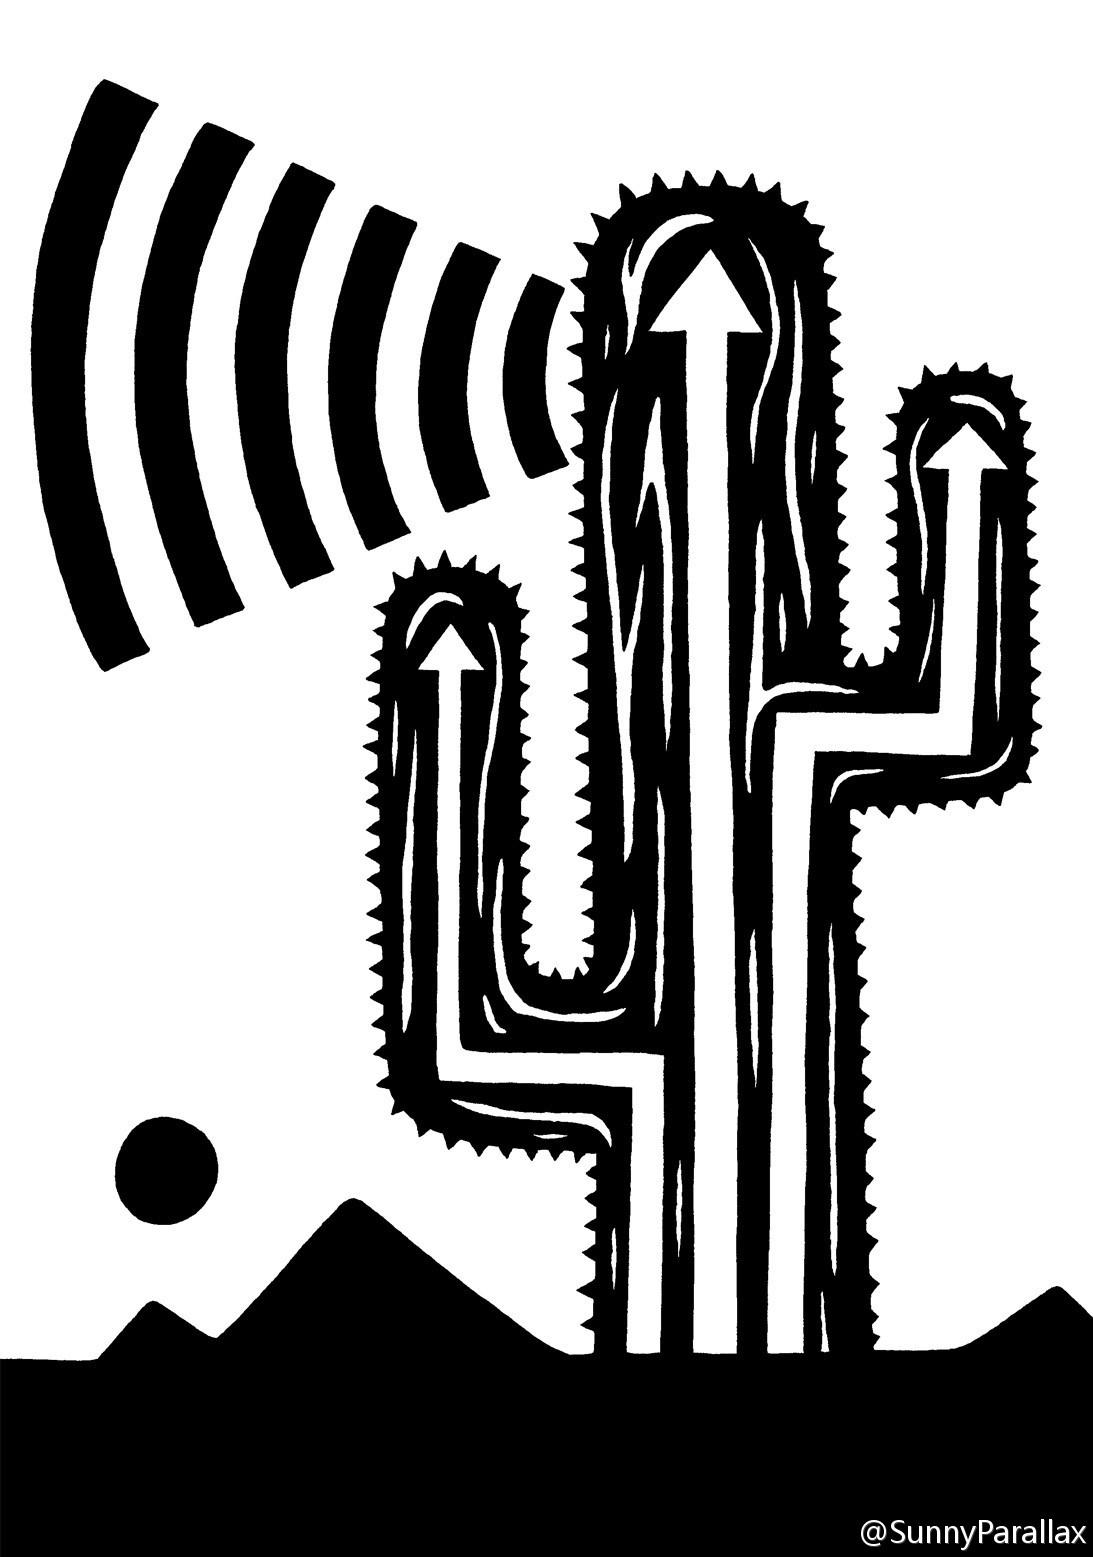 我上了【KaktusKast/仙人掌播报】第九期 7efef1a6jw1emm6xv7n12j20ud1790x3